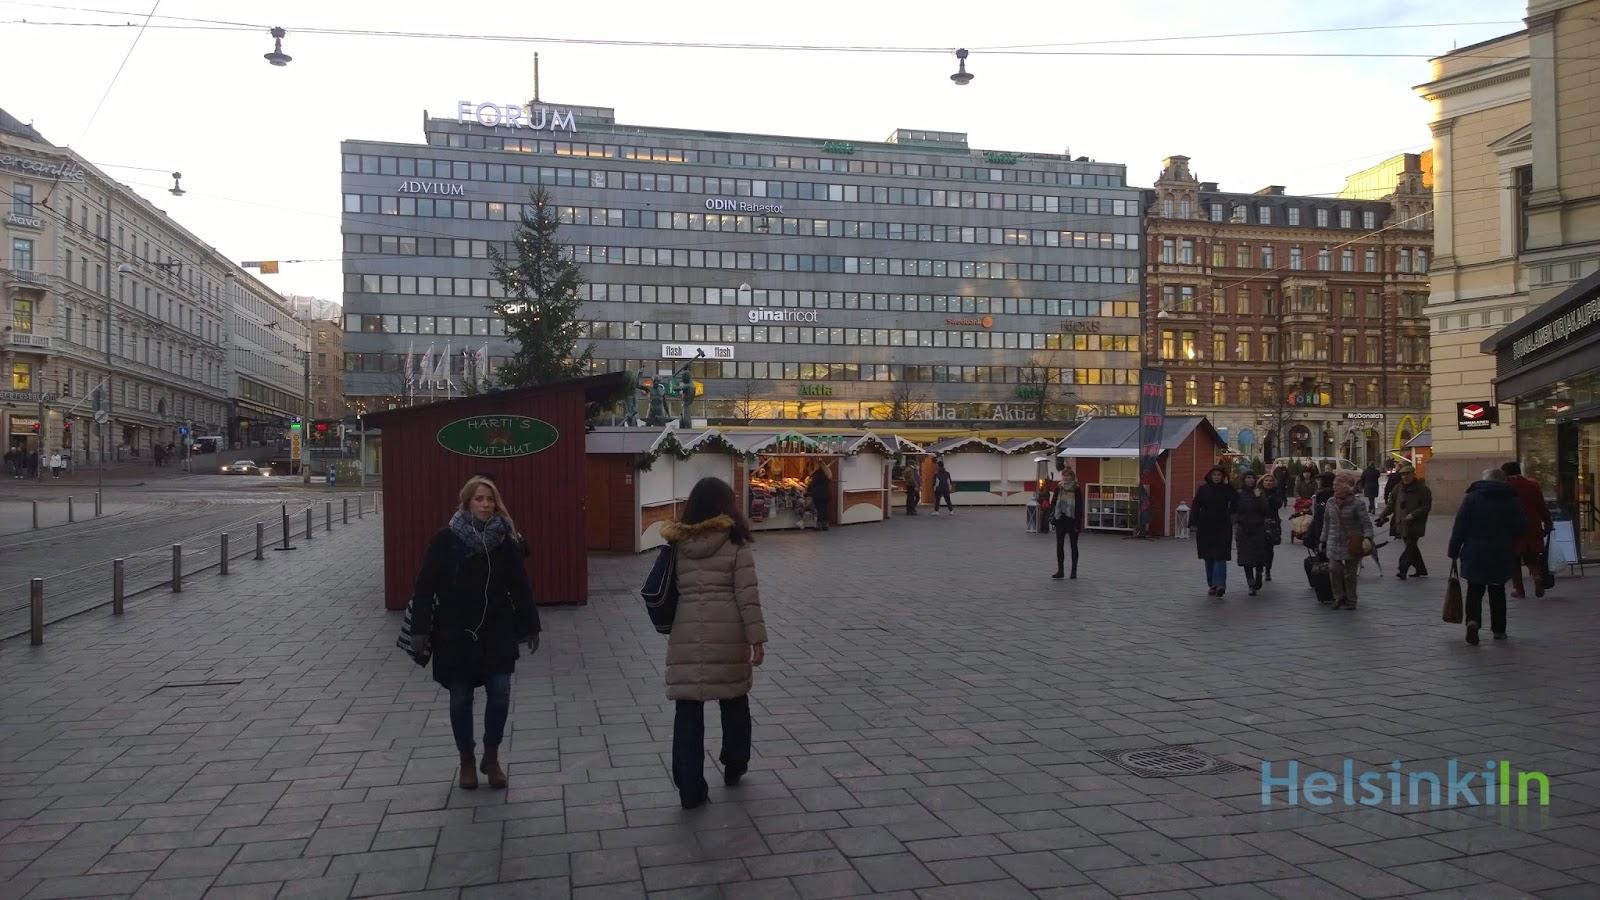 Joulumaailma in Helsinki